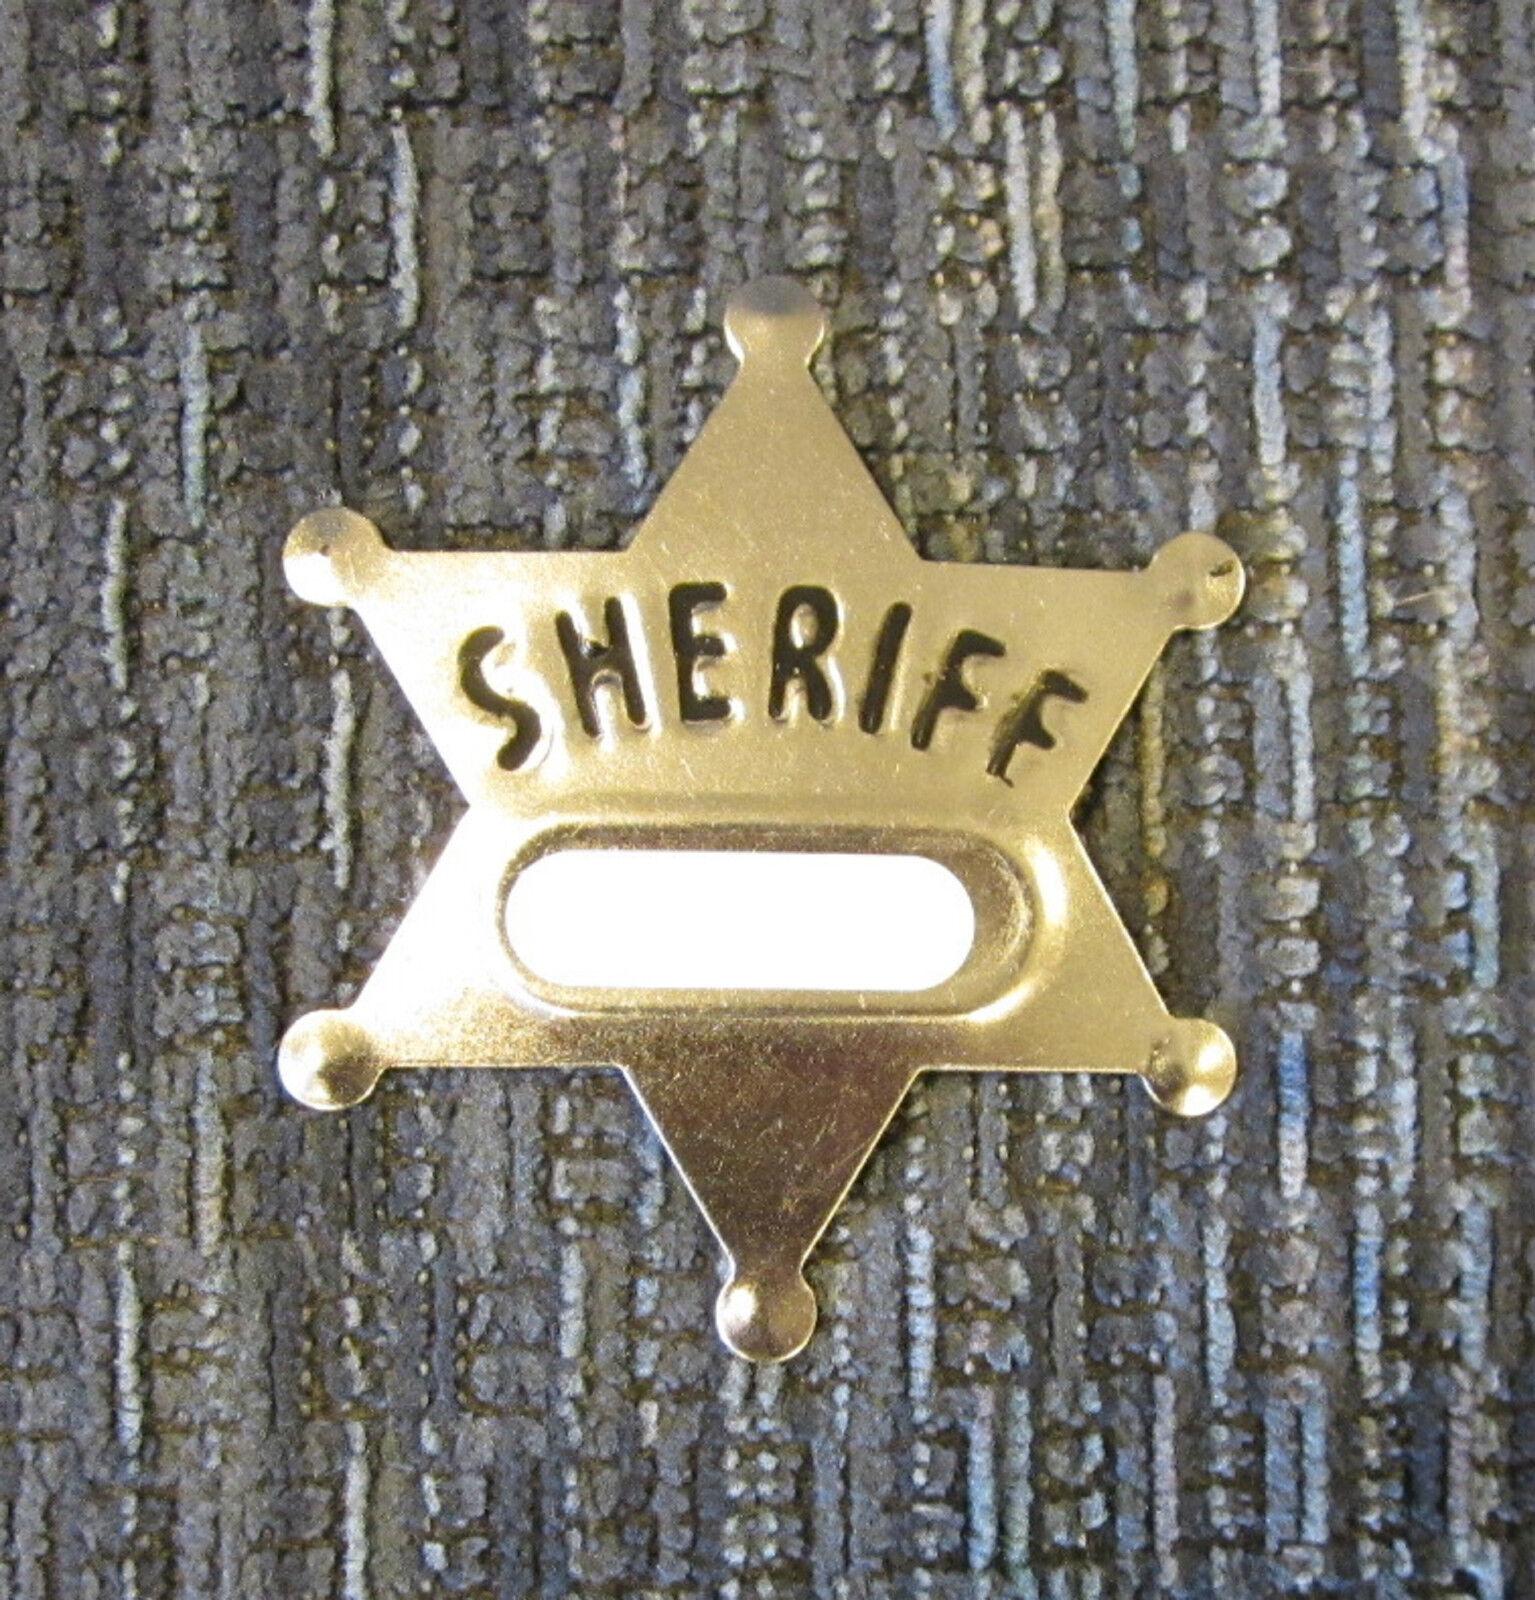 100 Nuevo Juguete Sheriff Insignias metálicas de plata de Vaquero Sheriff Badge favores de partido